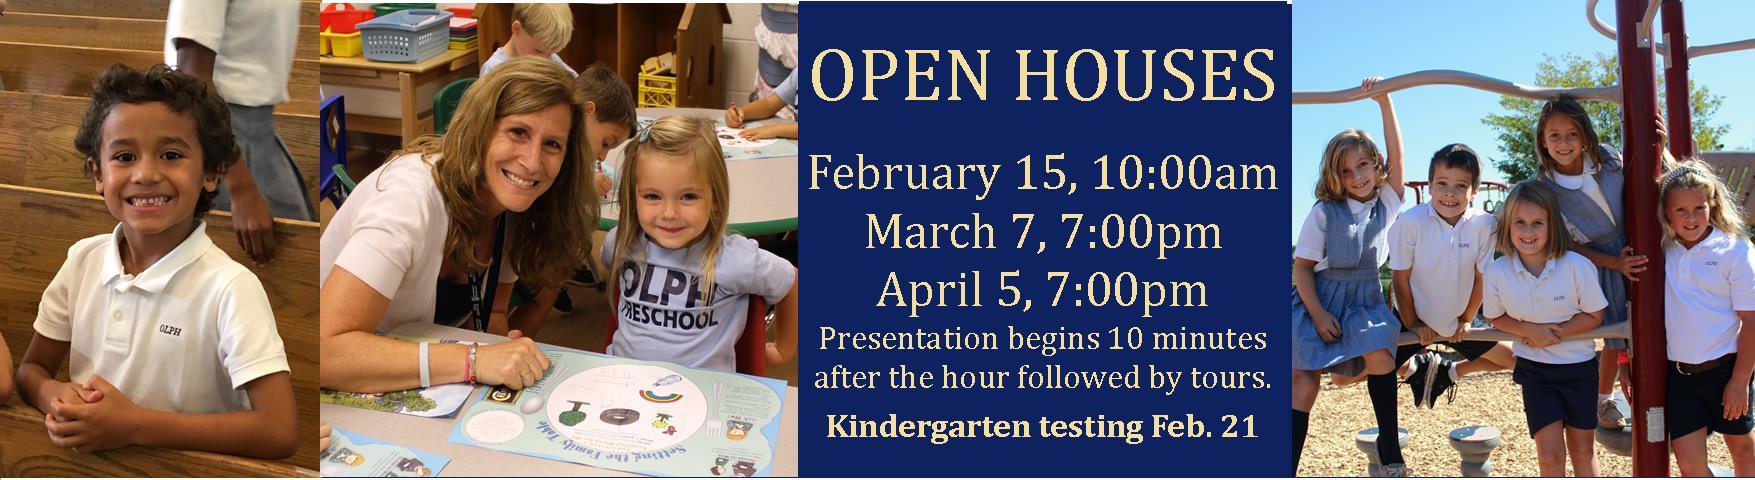 Feb.-March-April-open-house-slider-11.7-x-3.22